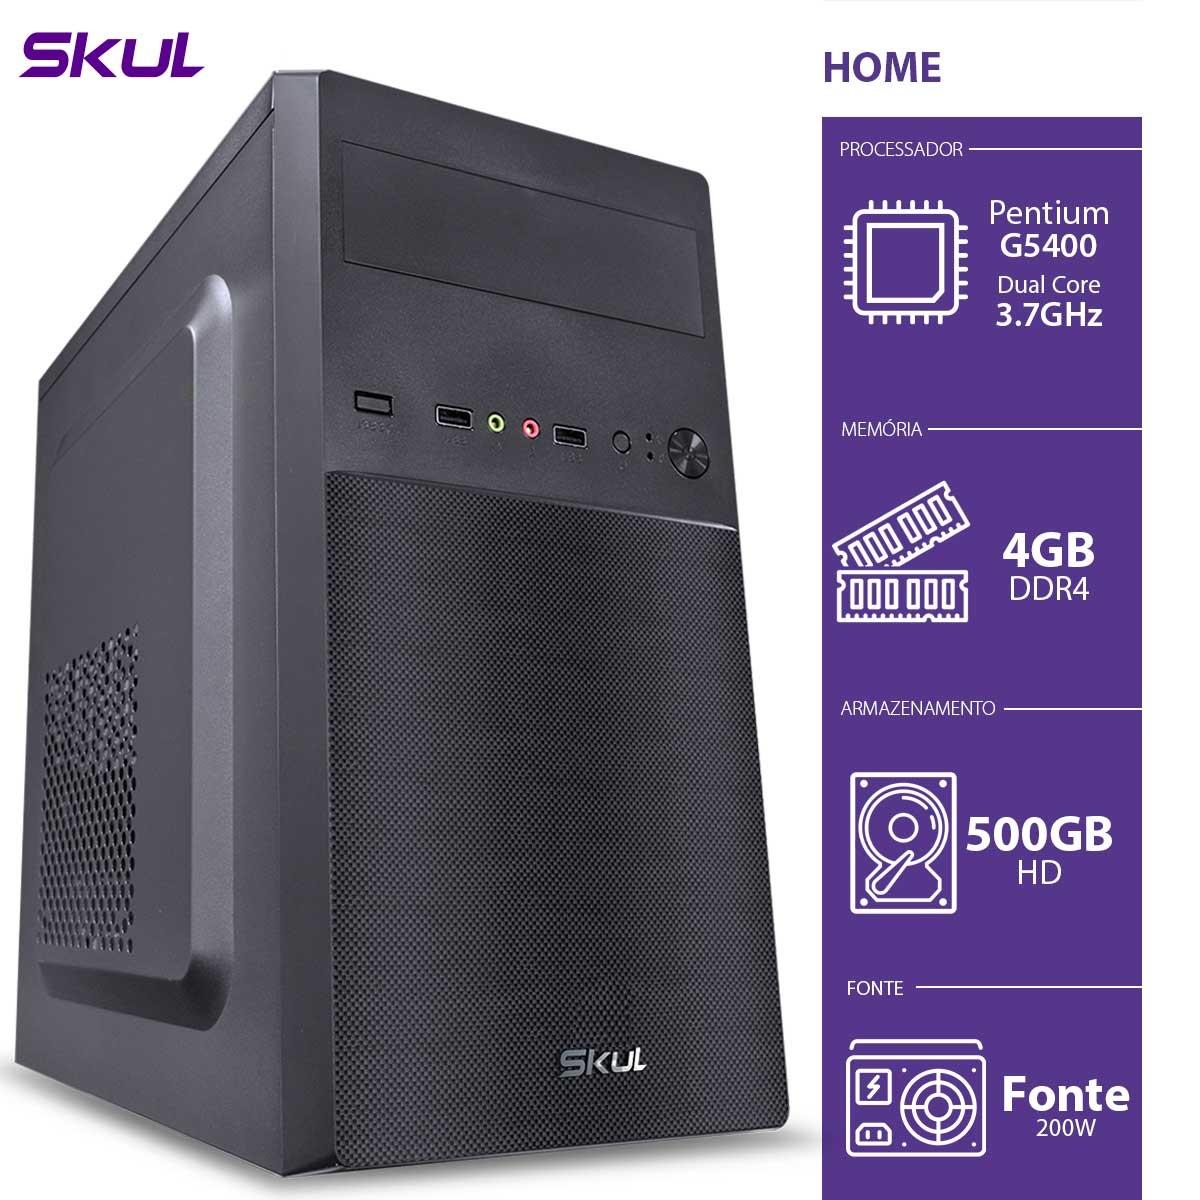 COMPUTADOR HOME H200 - PENTIUM DUAL CORE G5400 3.7GHZ MEM 4GB DDR4 HD 500GB HDMI/VGA FONTE 200W  - Audio Video & cia